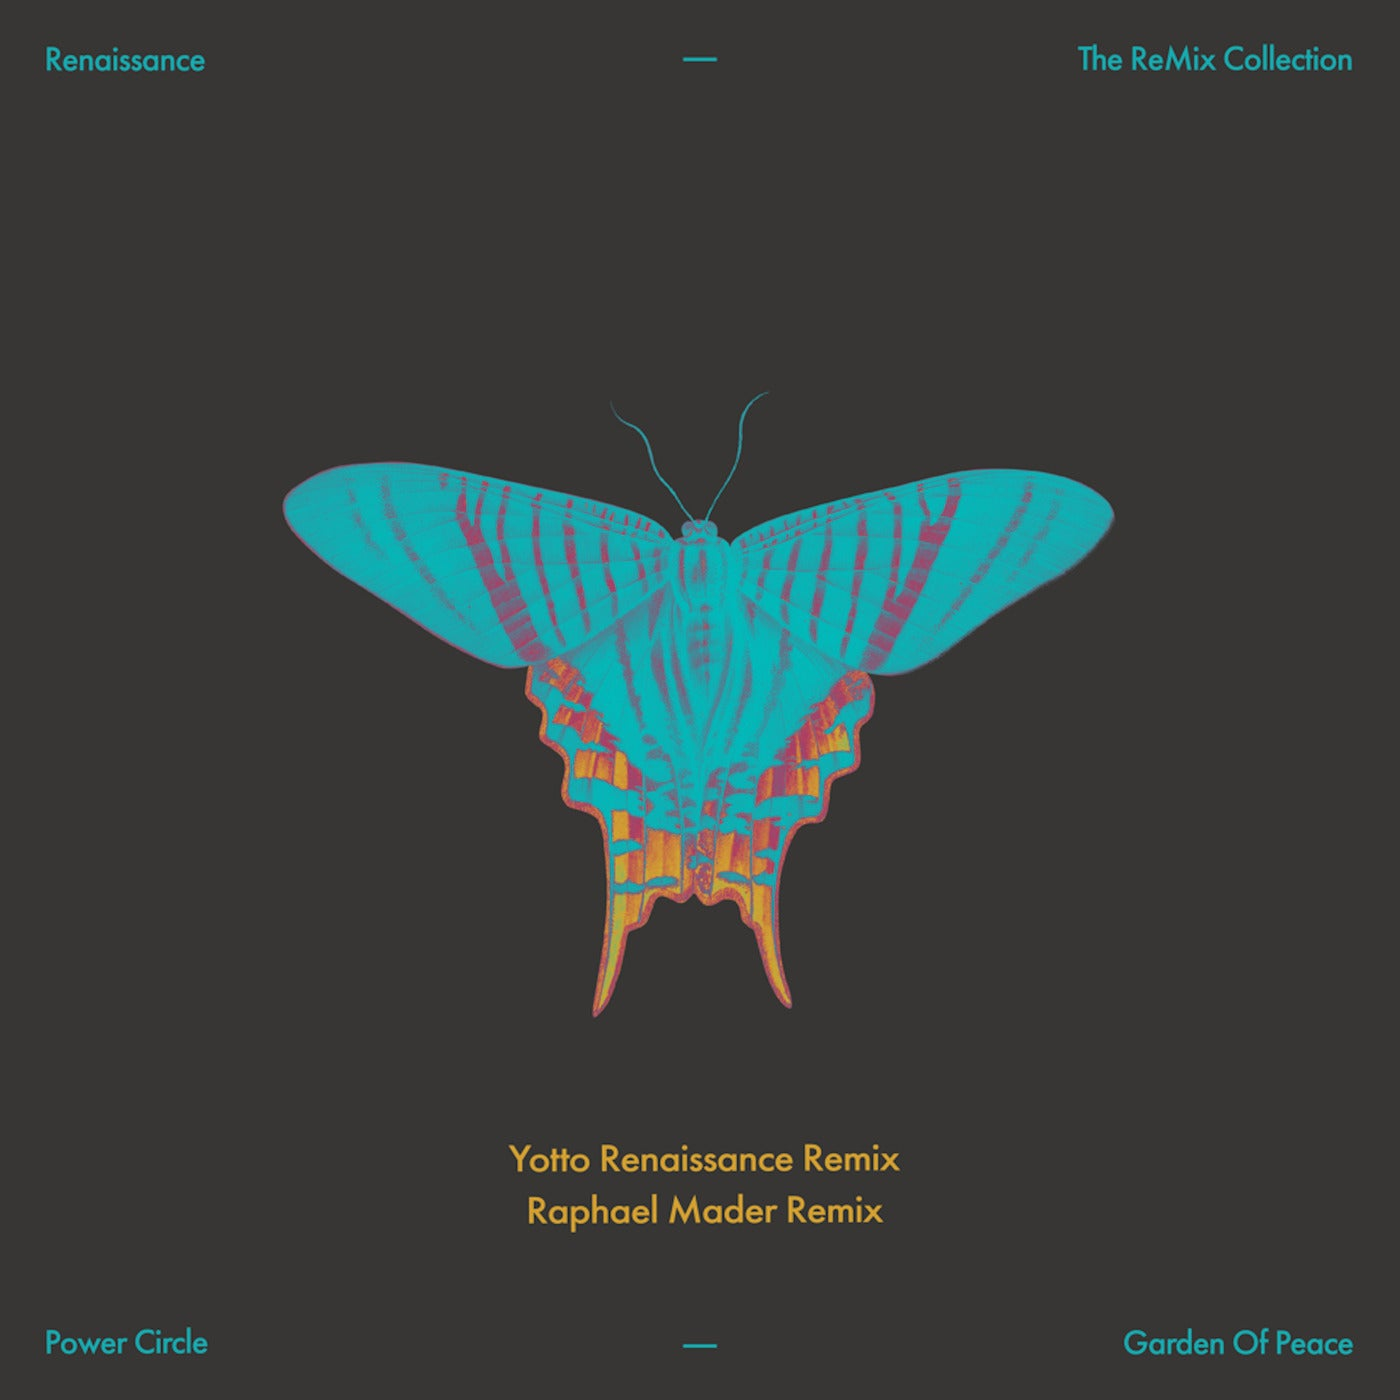 Garden Of Peace (Yotto Renaissance Remix)